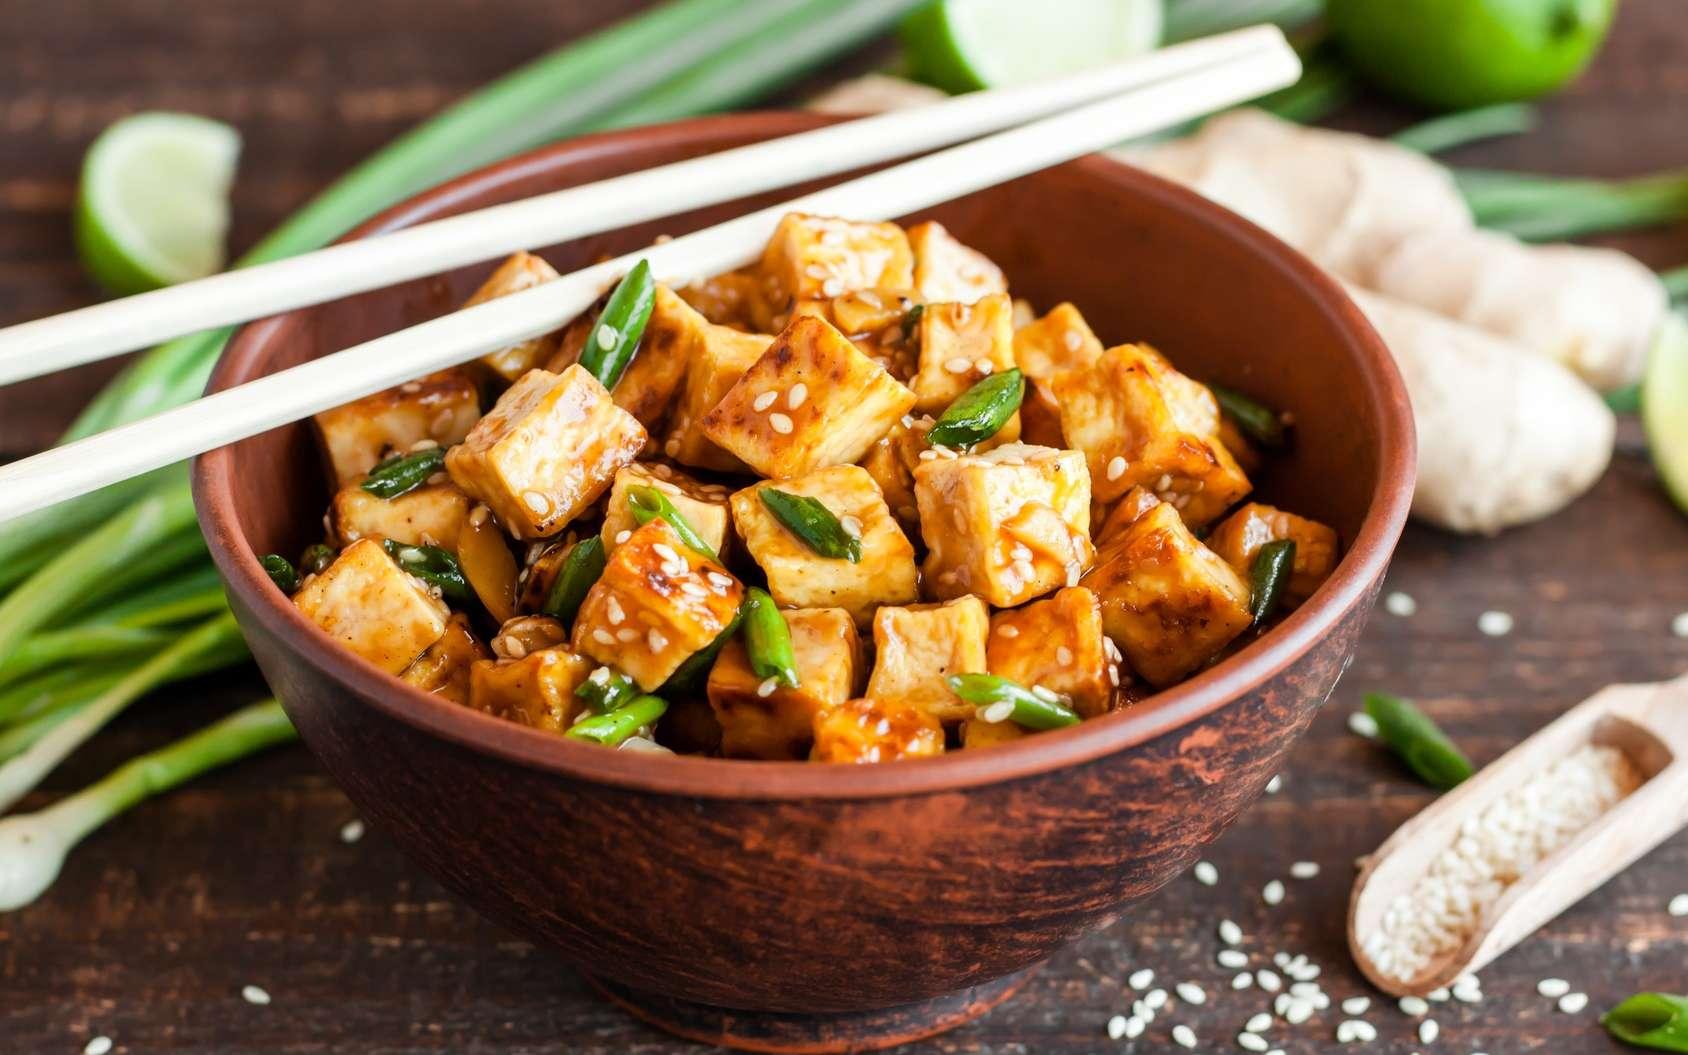 Le tofu est originaire d'Asie. © yuliiaholovchenko, Fotolia